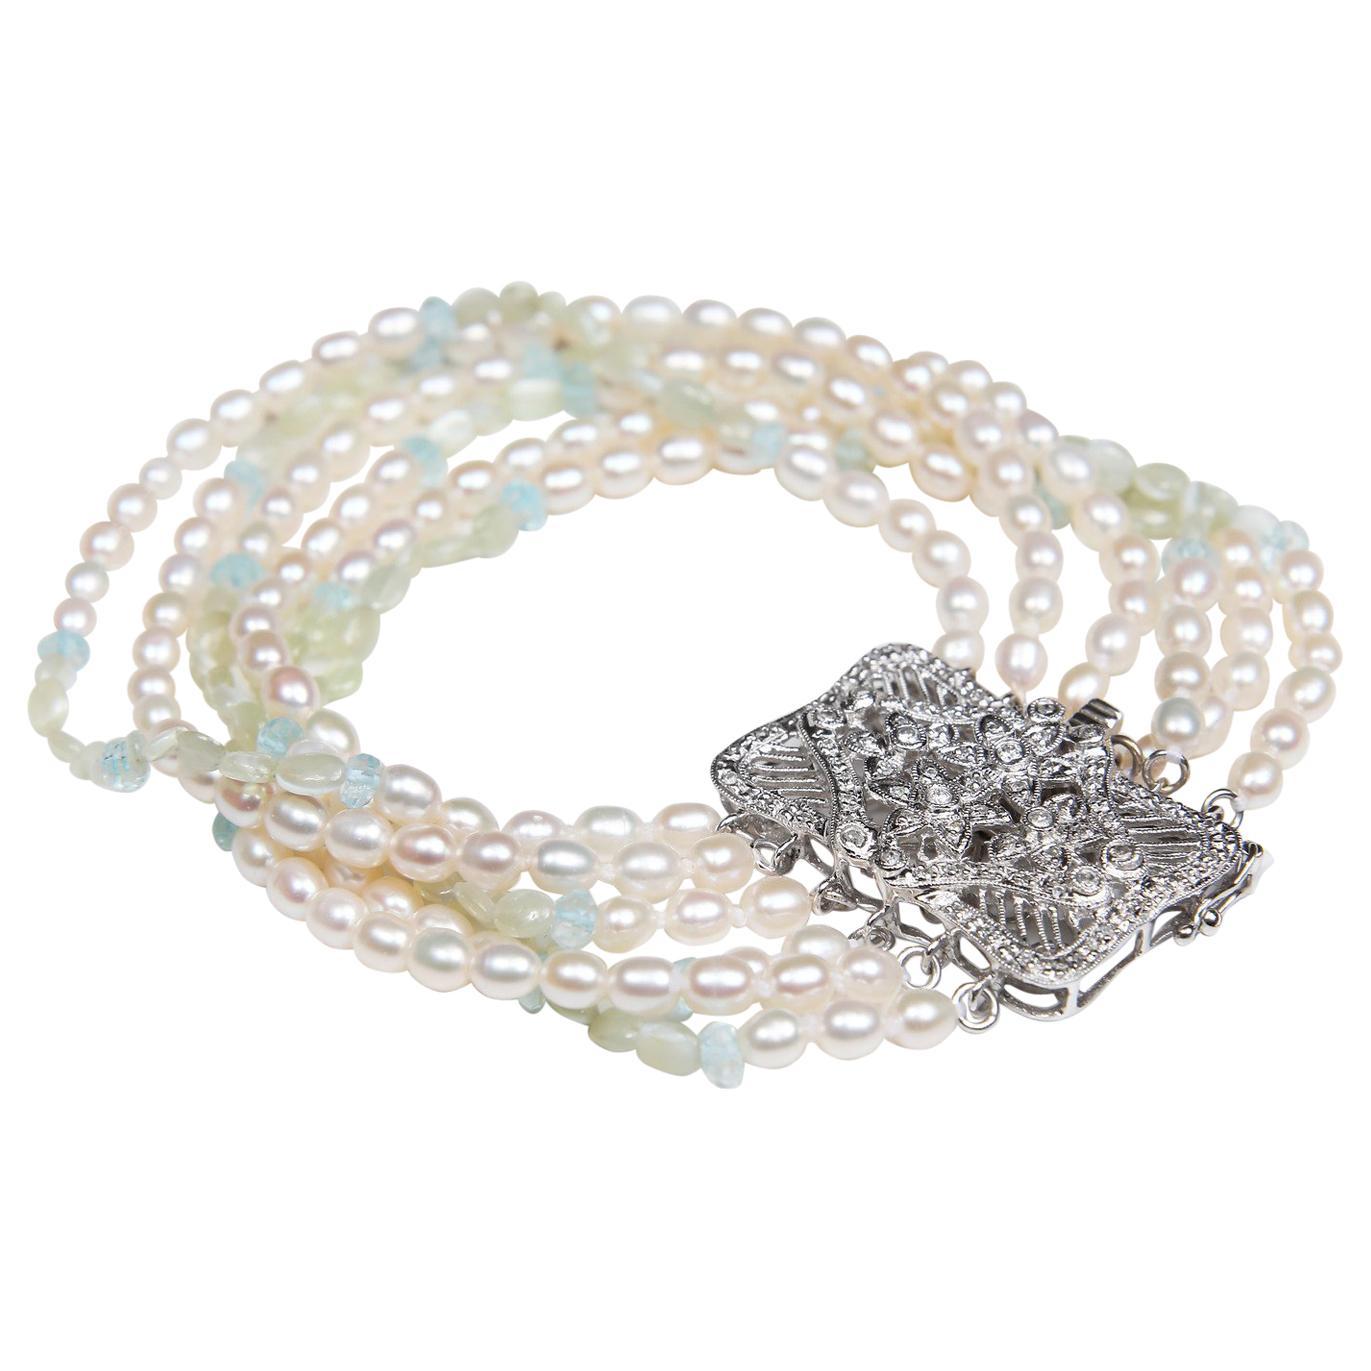 White Orchid Studio It's OK Victoria Pearls Topaz Diamonds Gold Bracelet